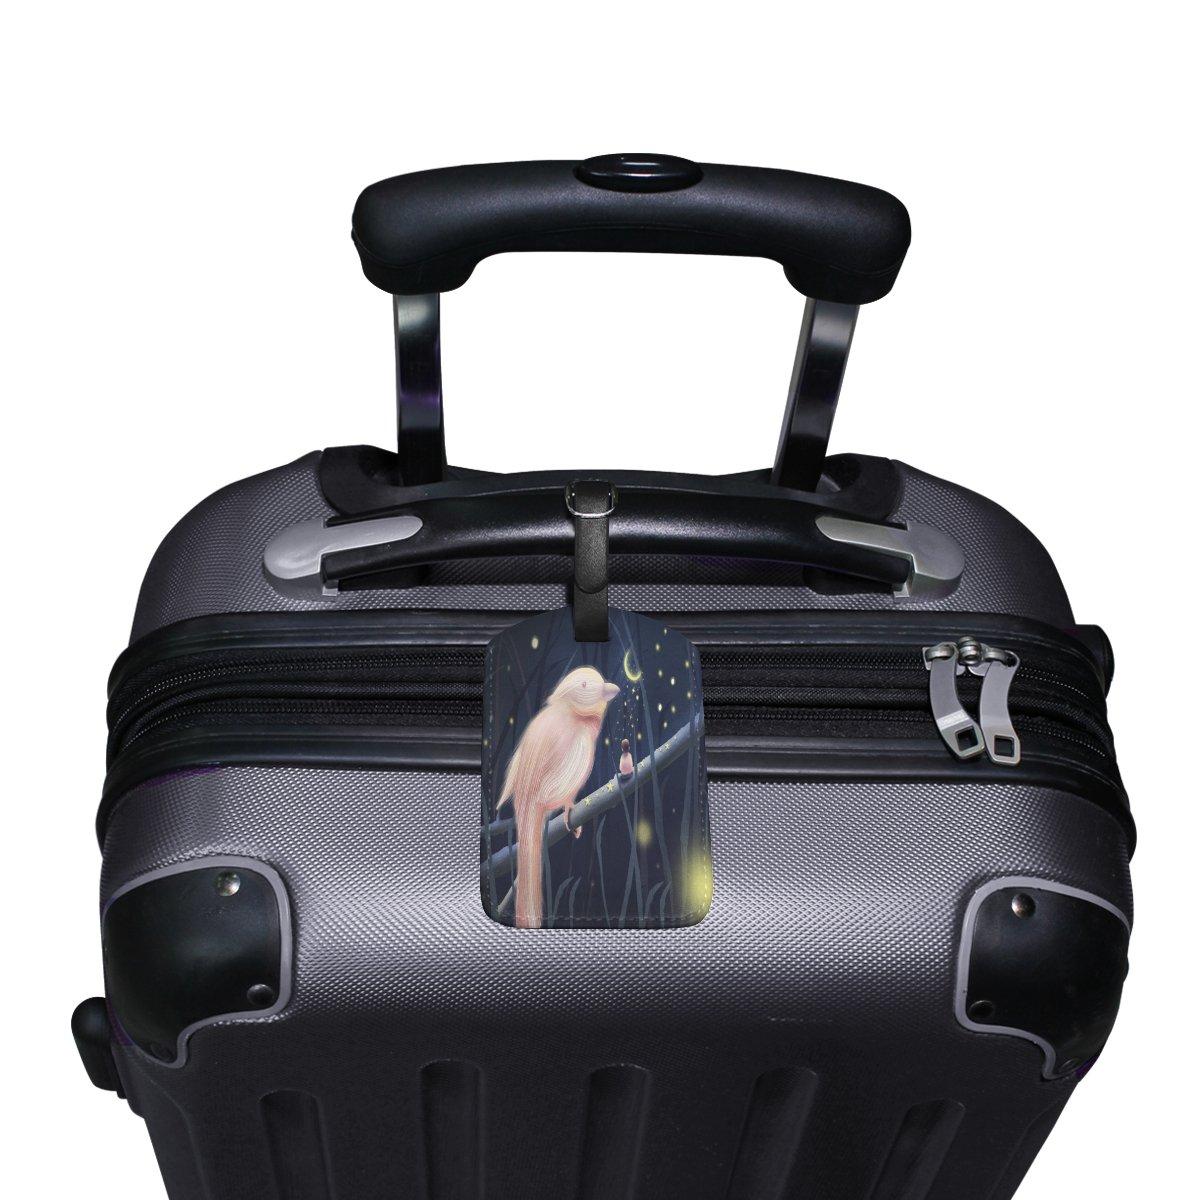 Saobao Travel Luggage Tag Jungle And Boy PU Leather Baggage Suitcase Travel ID Bag Tag 1Pcs